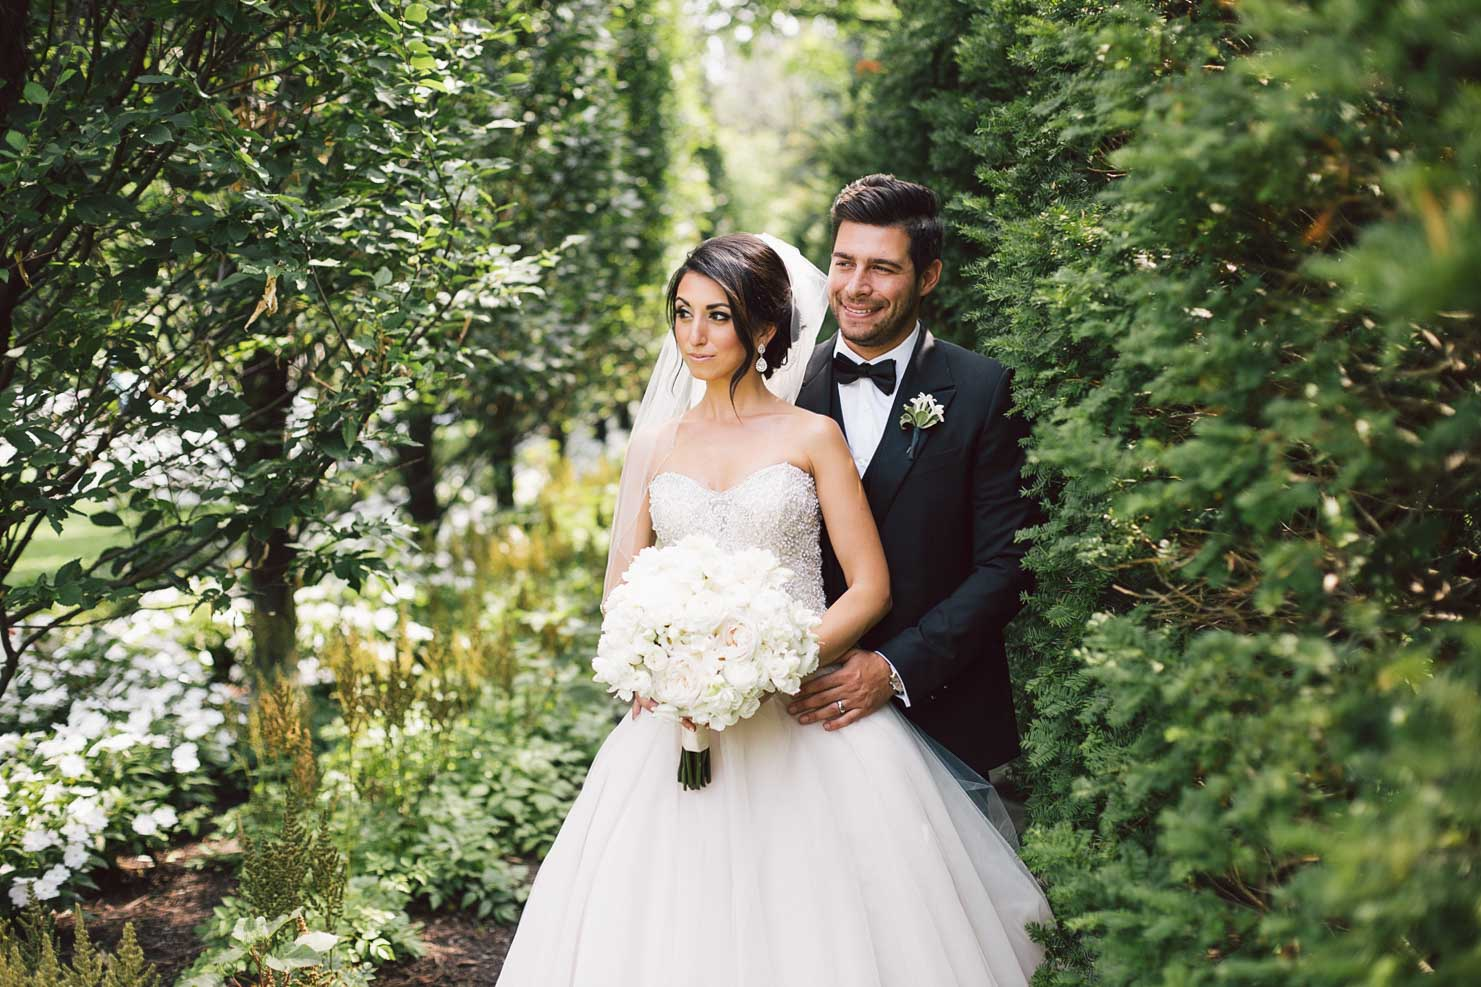 wedding at graydon hall manor